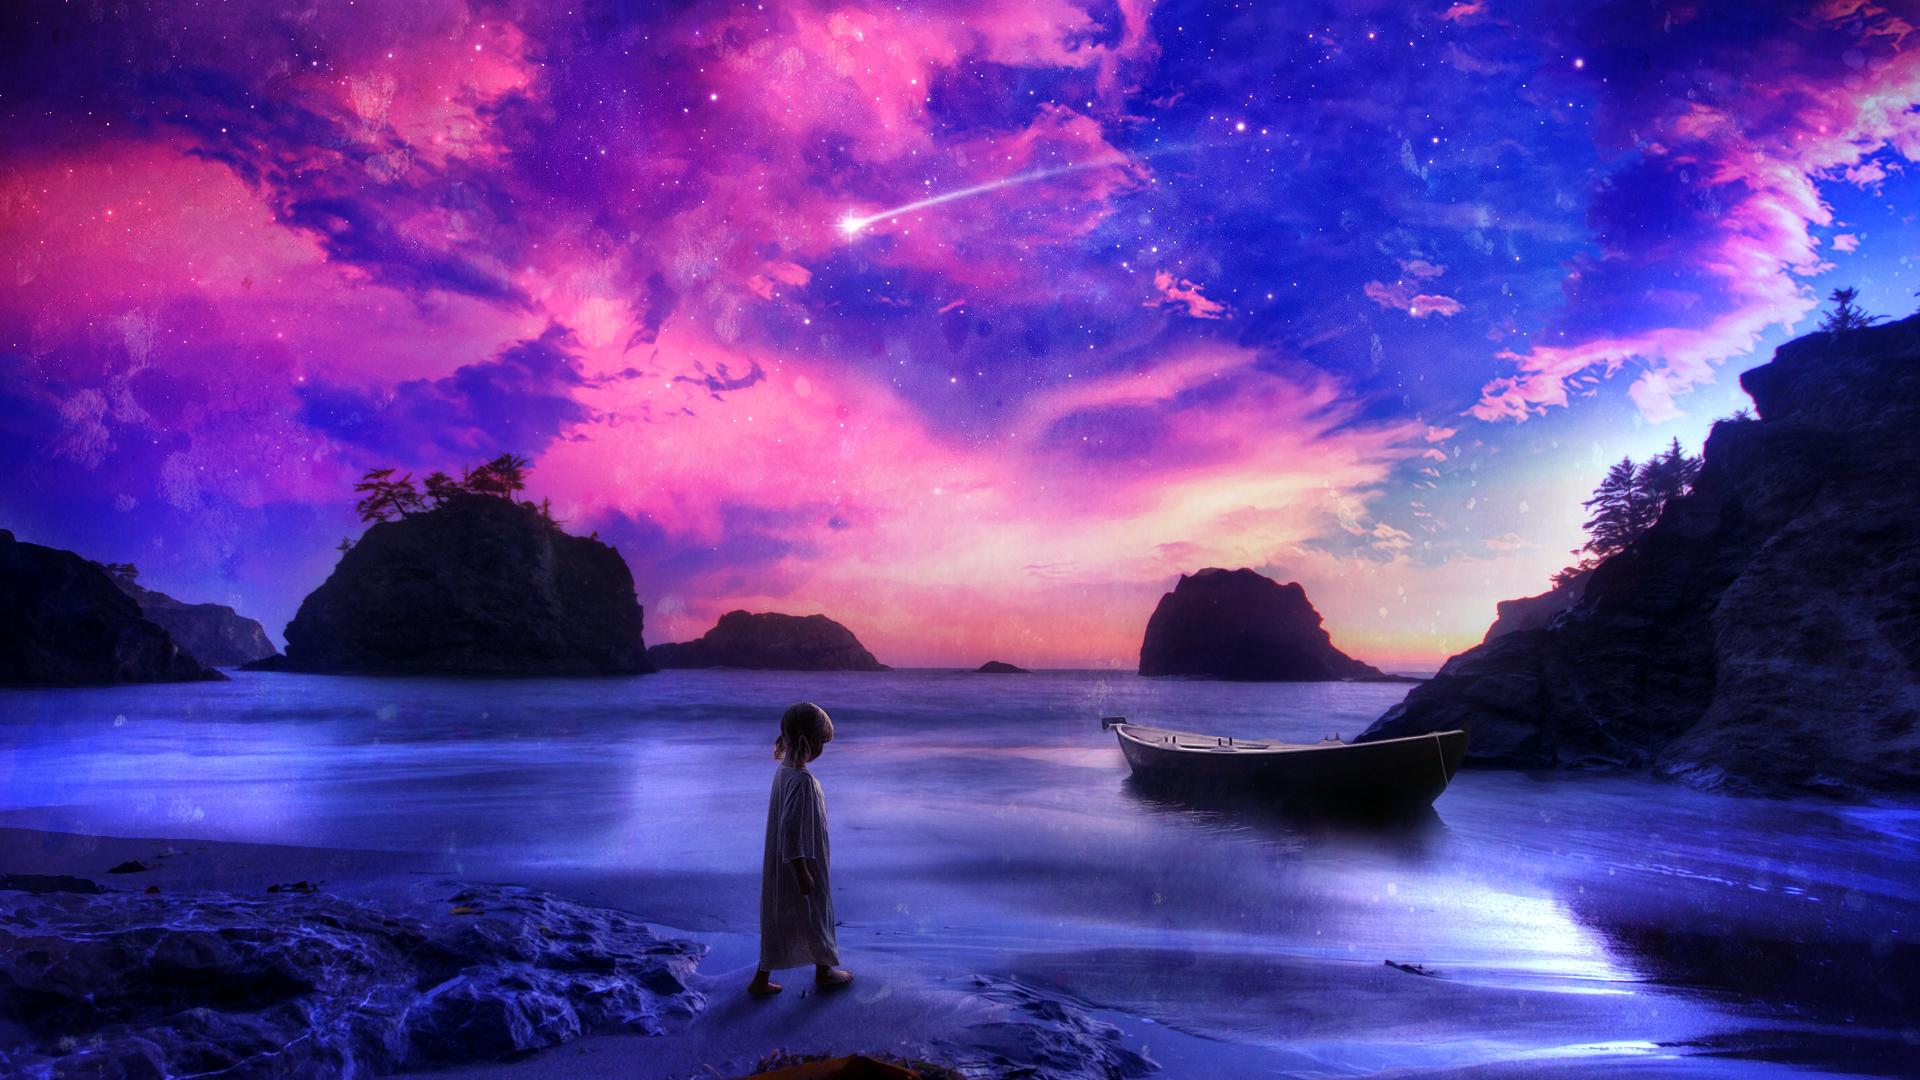 Child Shore Beach Purple Boat Stars Shooting Star fantasy ocean sea 1920x1080